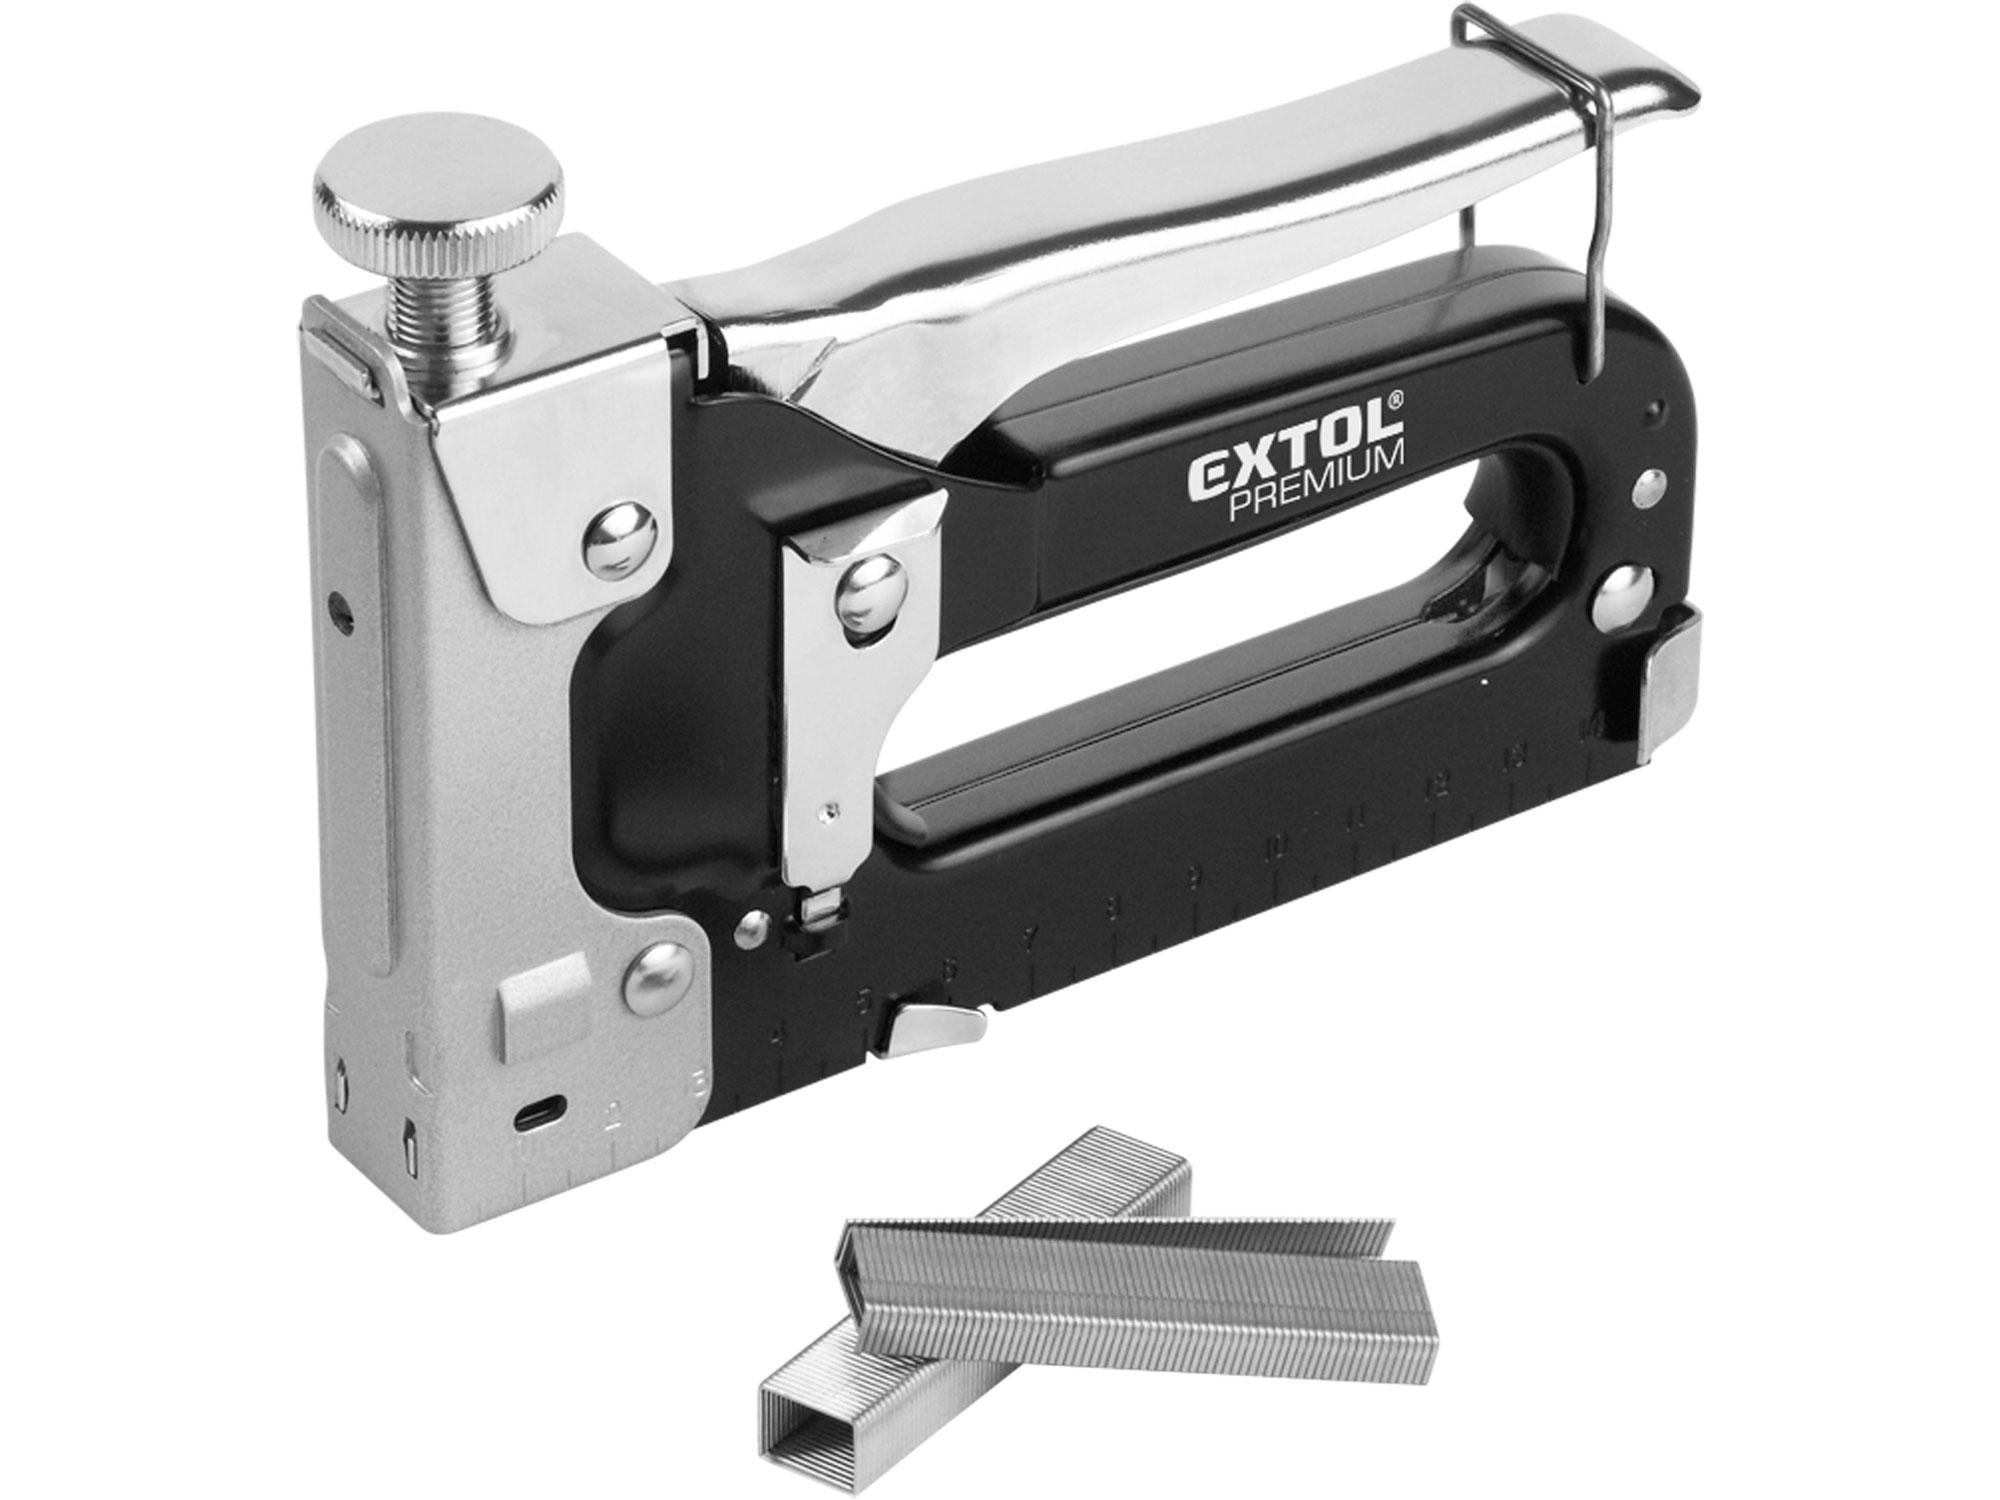 Pistole sponkovací, 4-14mm EXTOL PREMIUM 8851100